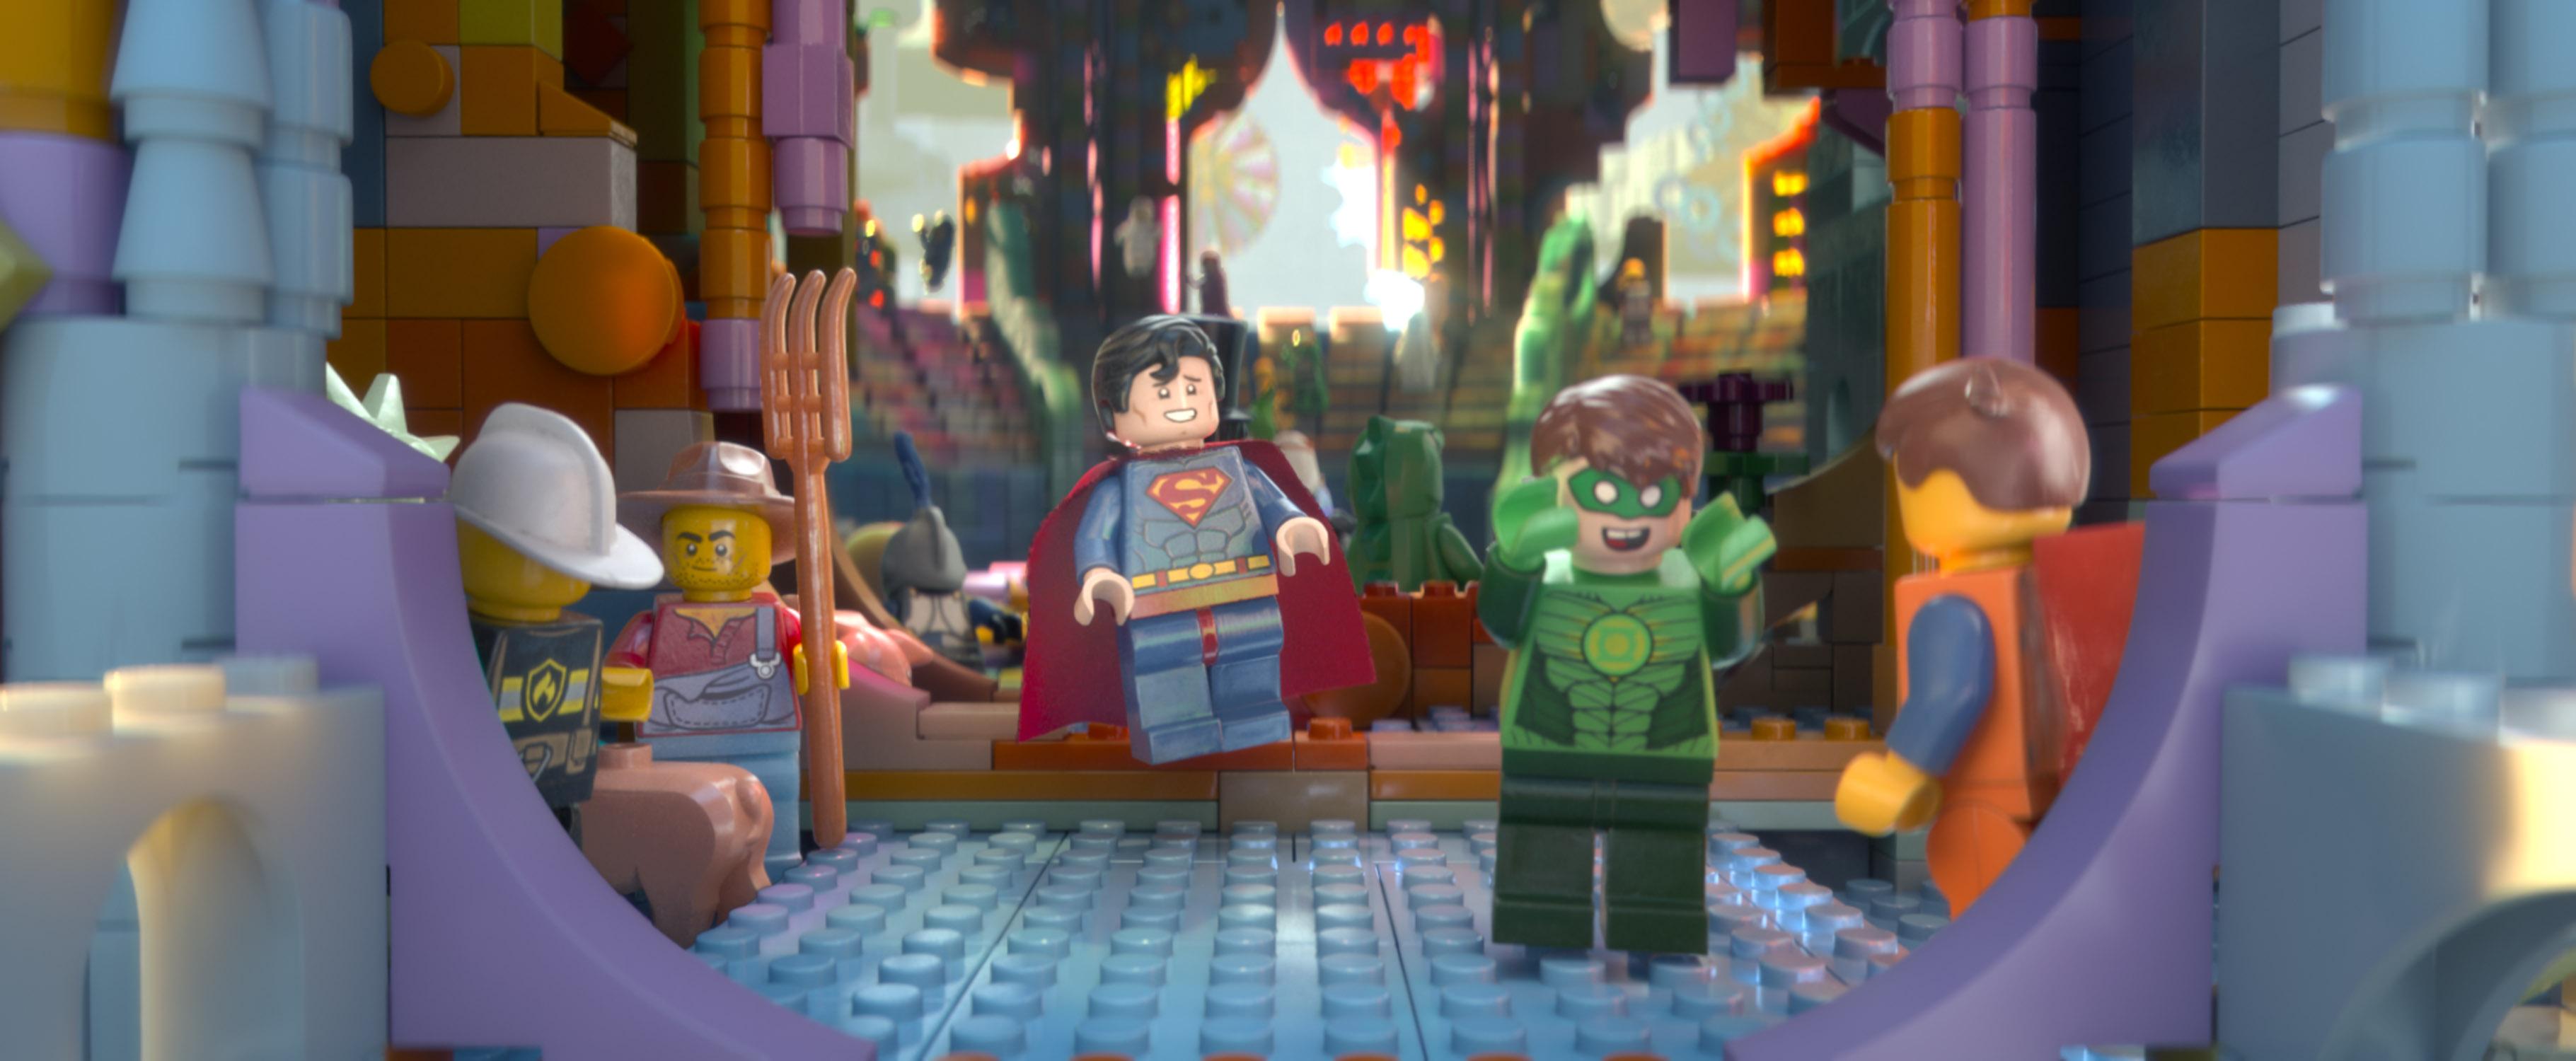 Channing Tatum - Superman in THE LEGO MOVIE